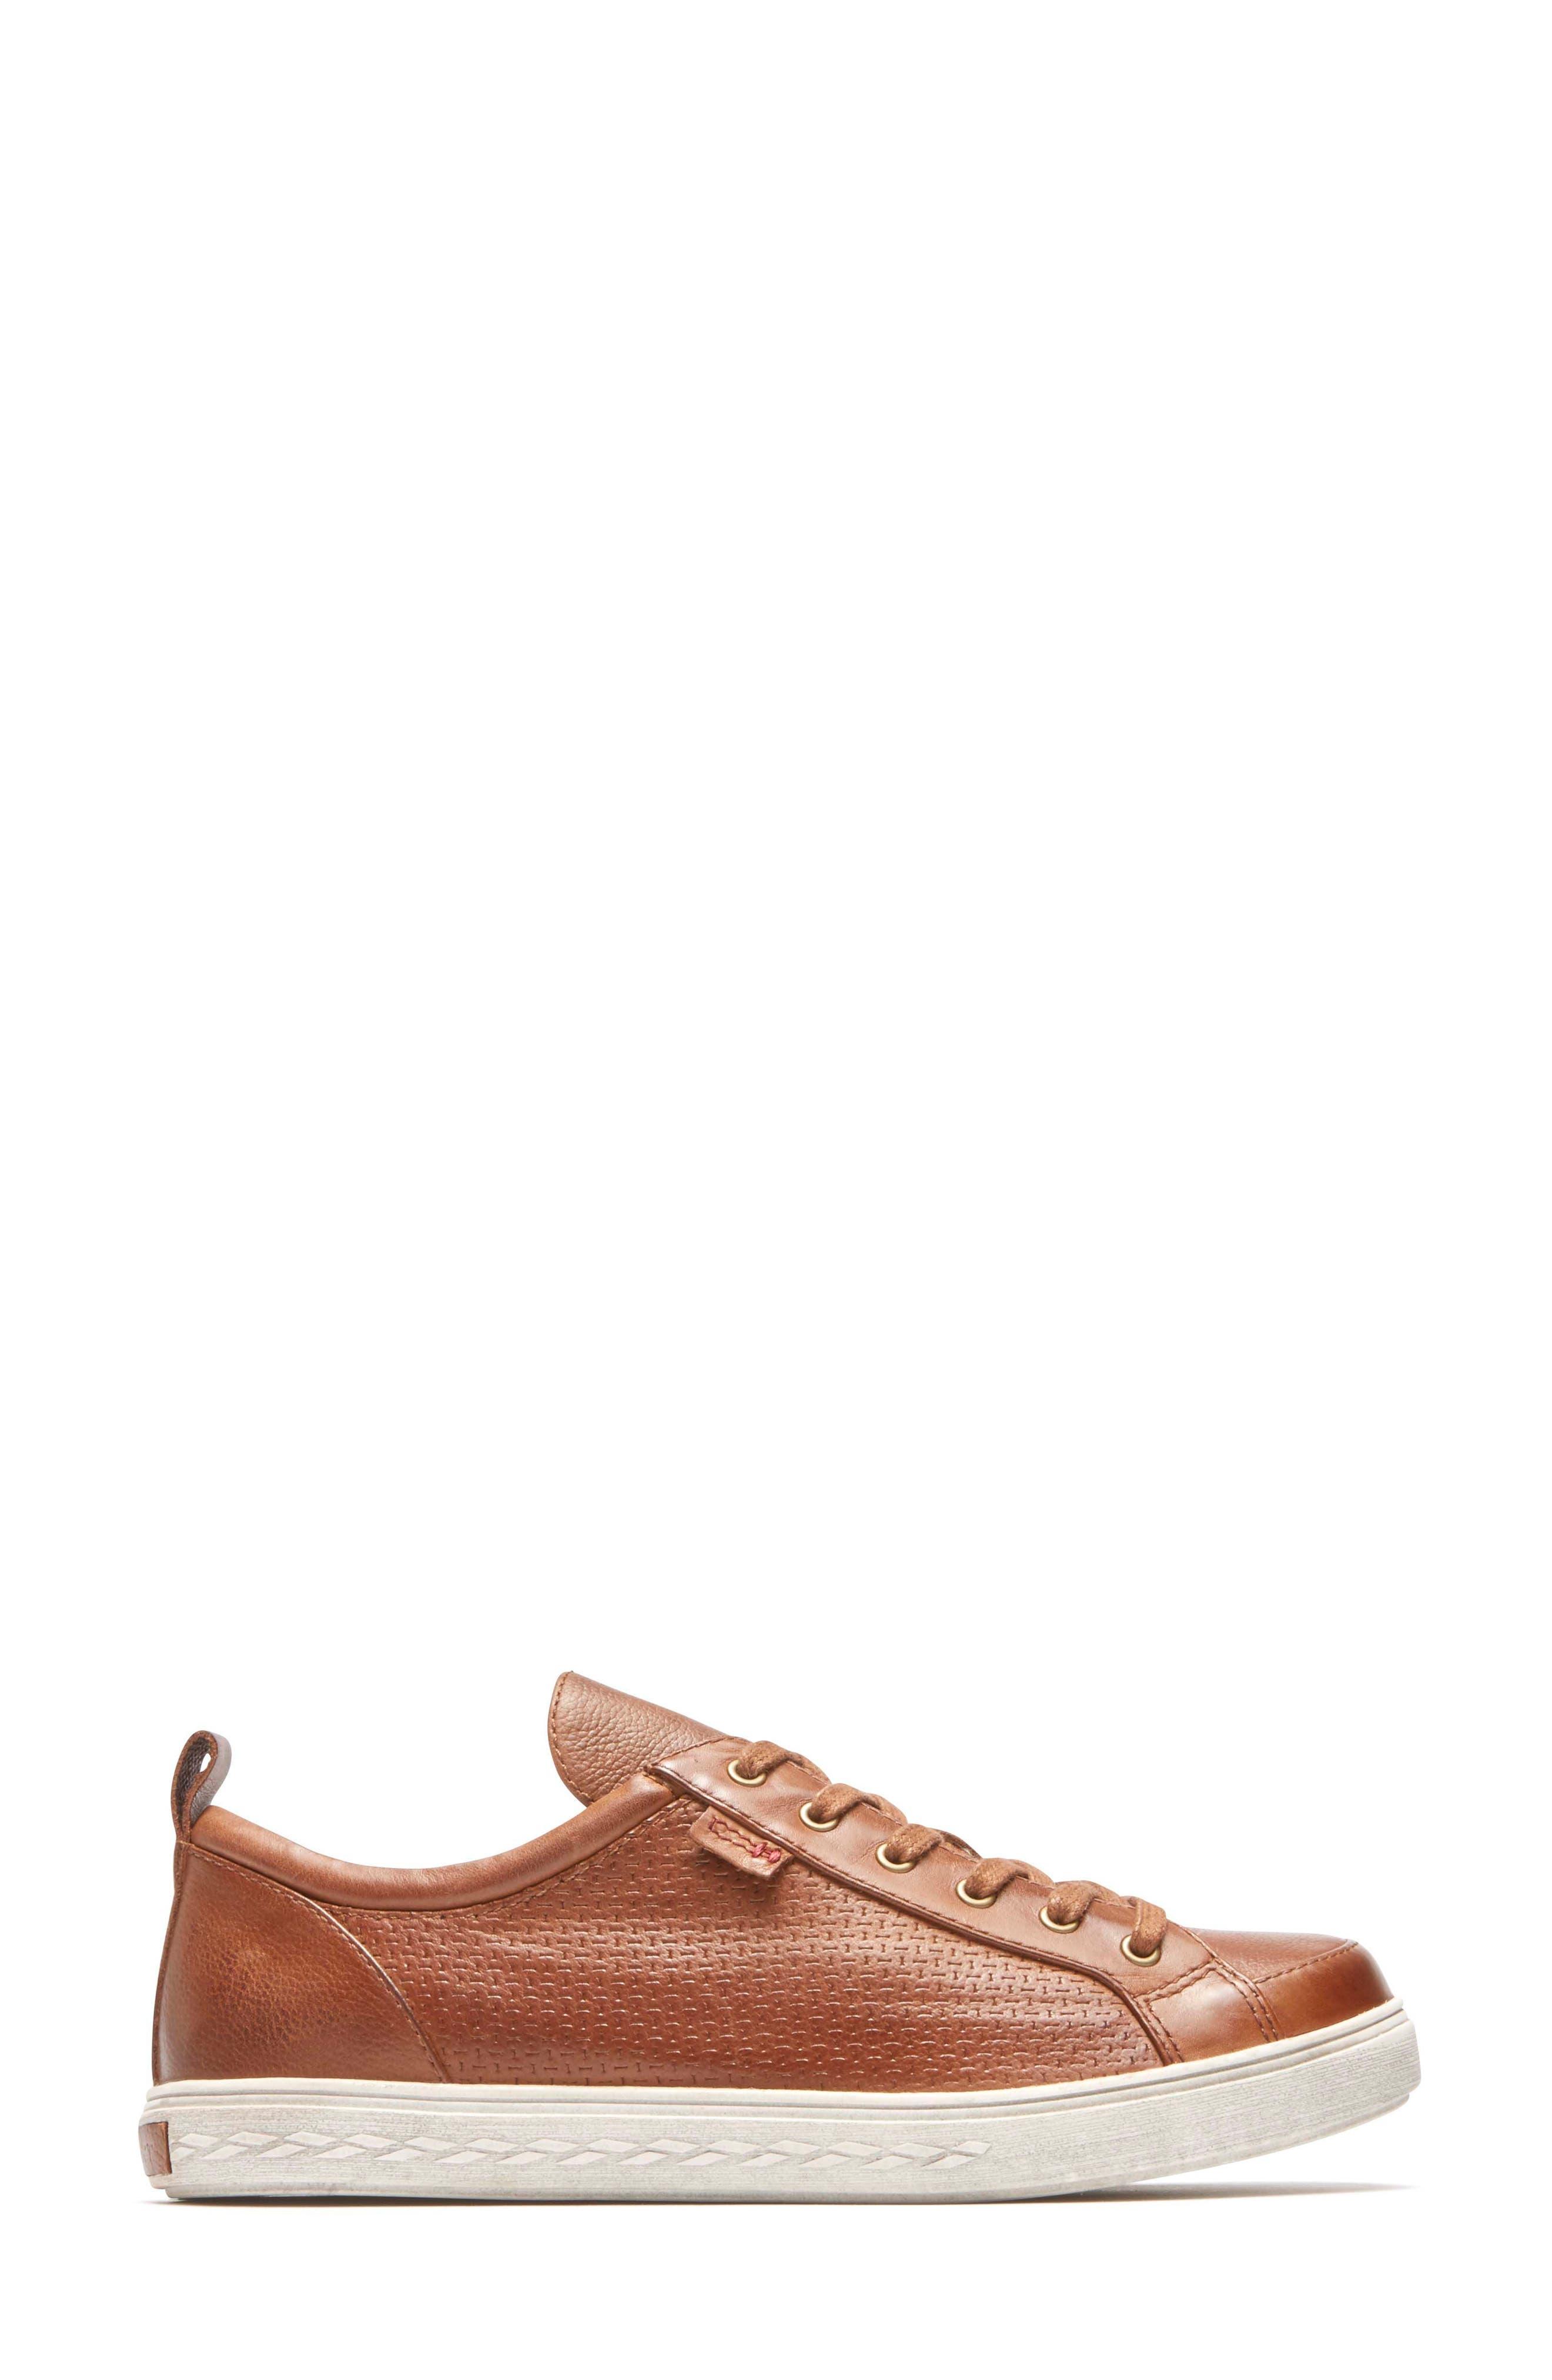 Willa Sneaker,                             Alternate thumbnail 3, color,                             Almond Leather